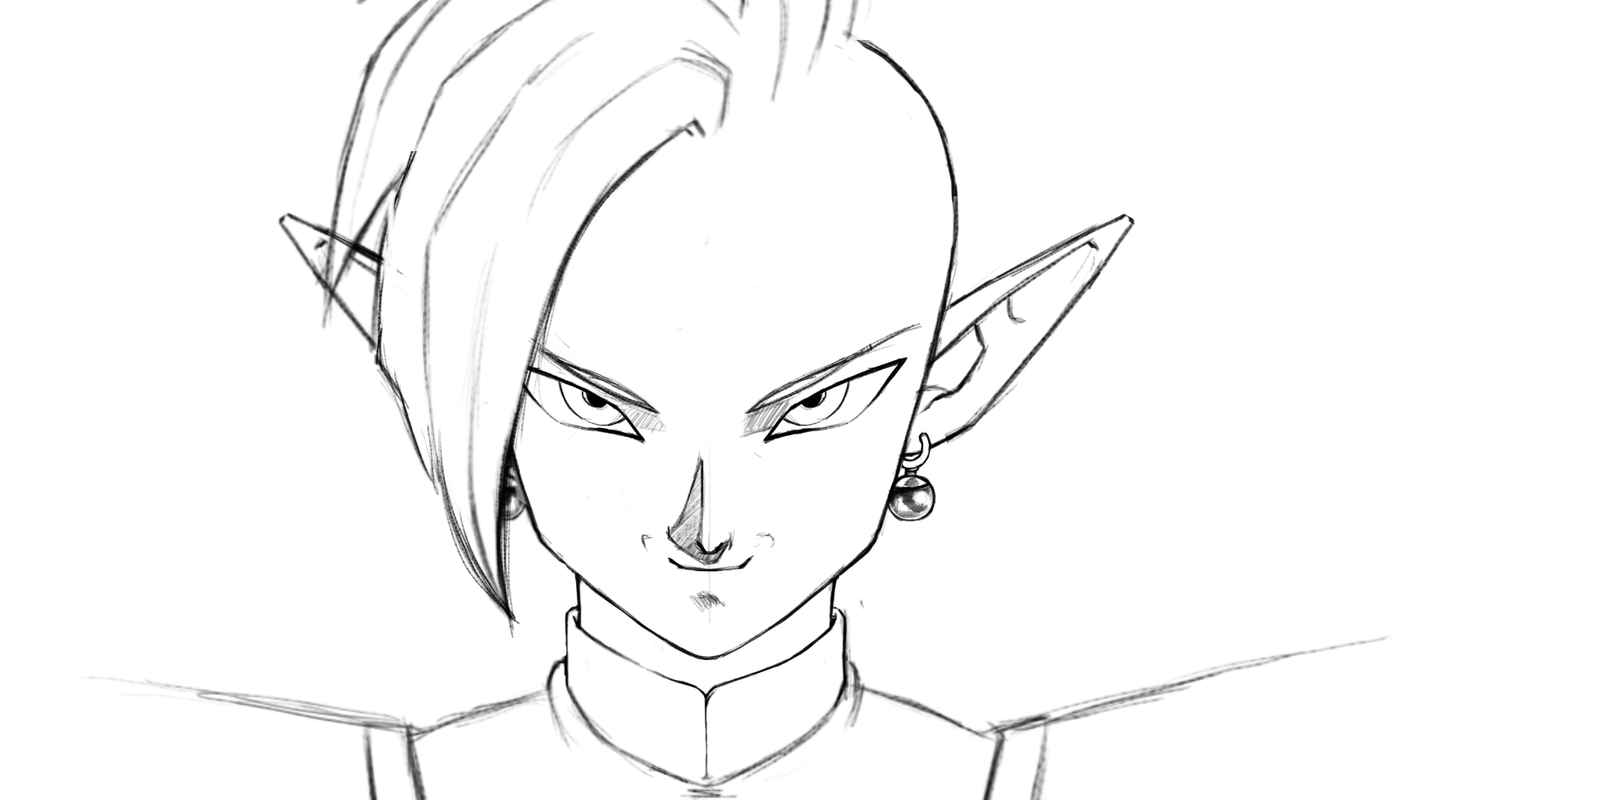 In-progress Zamasu From Dragon Ball Super By KevinFrank123